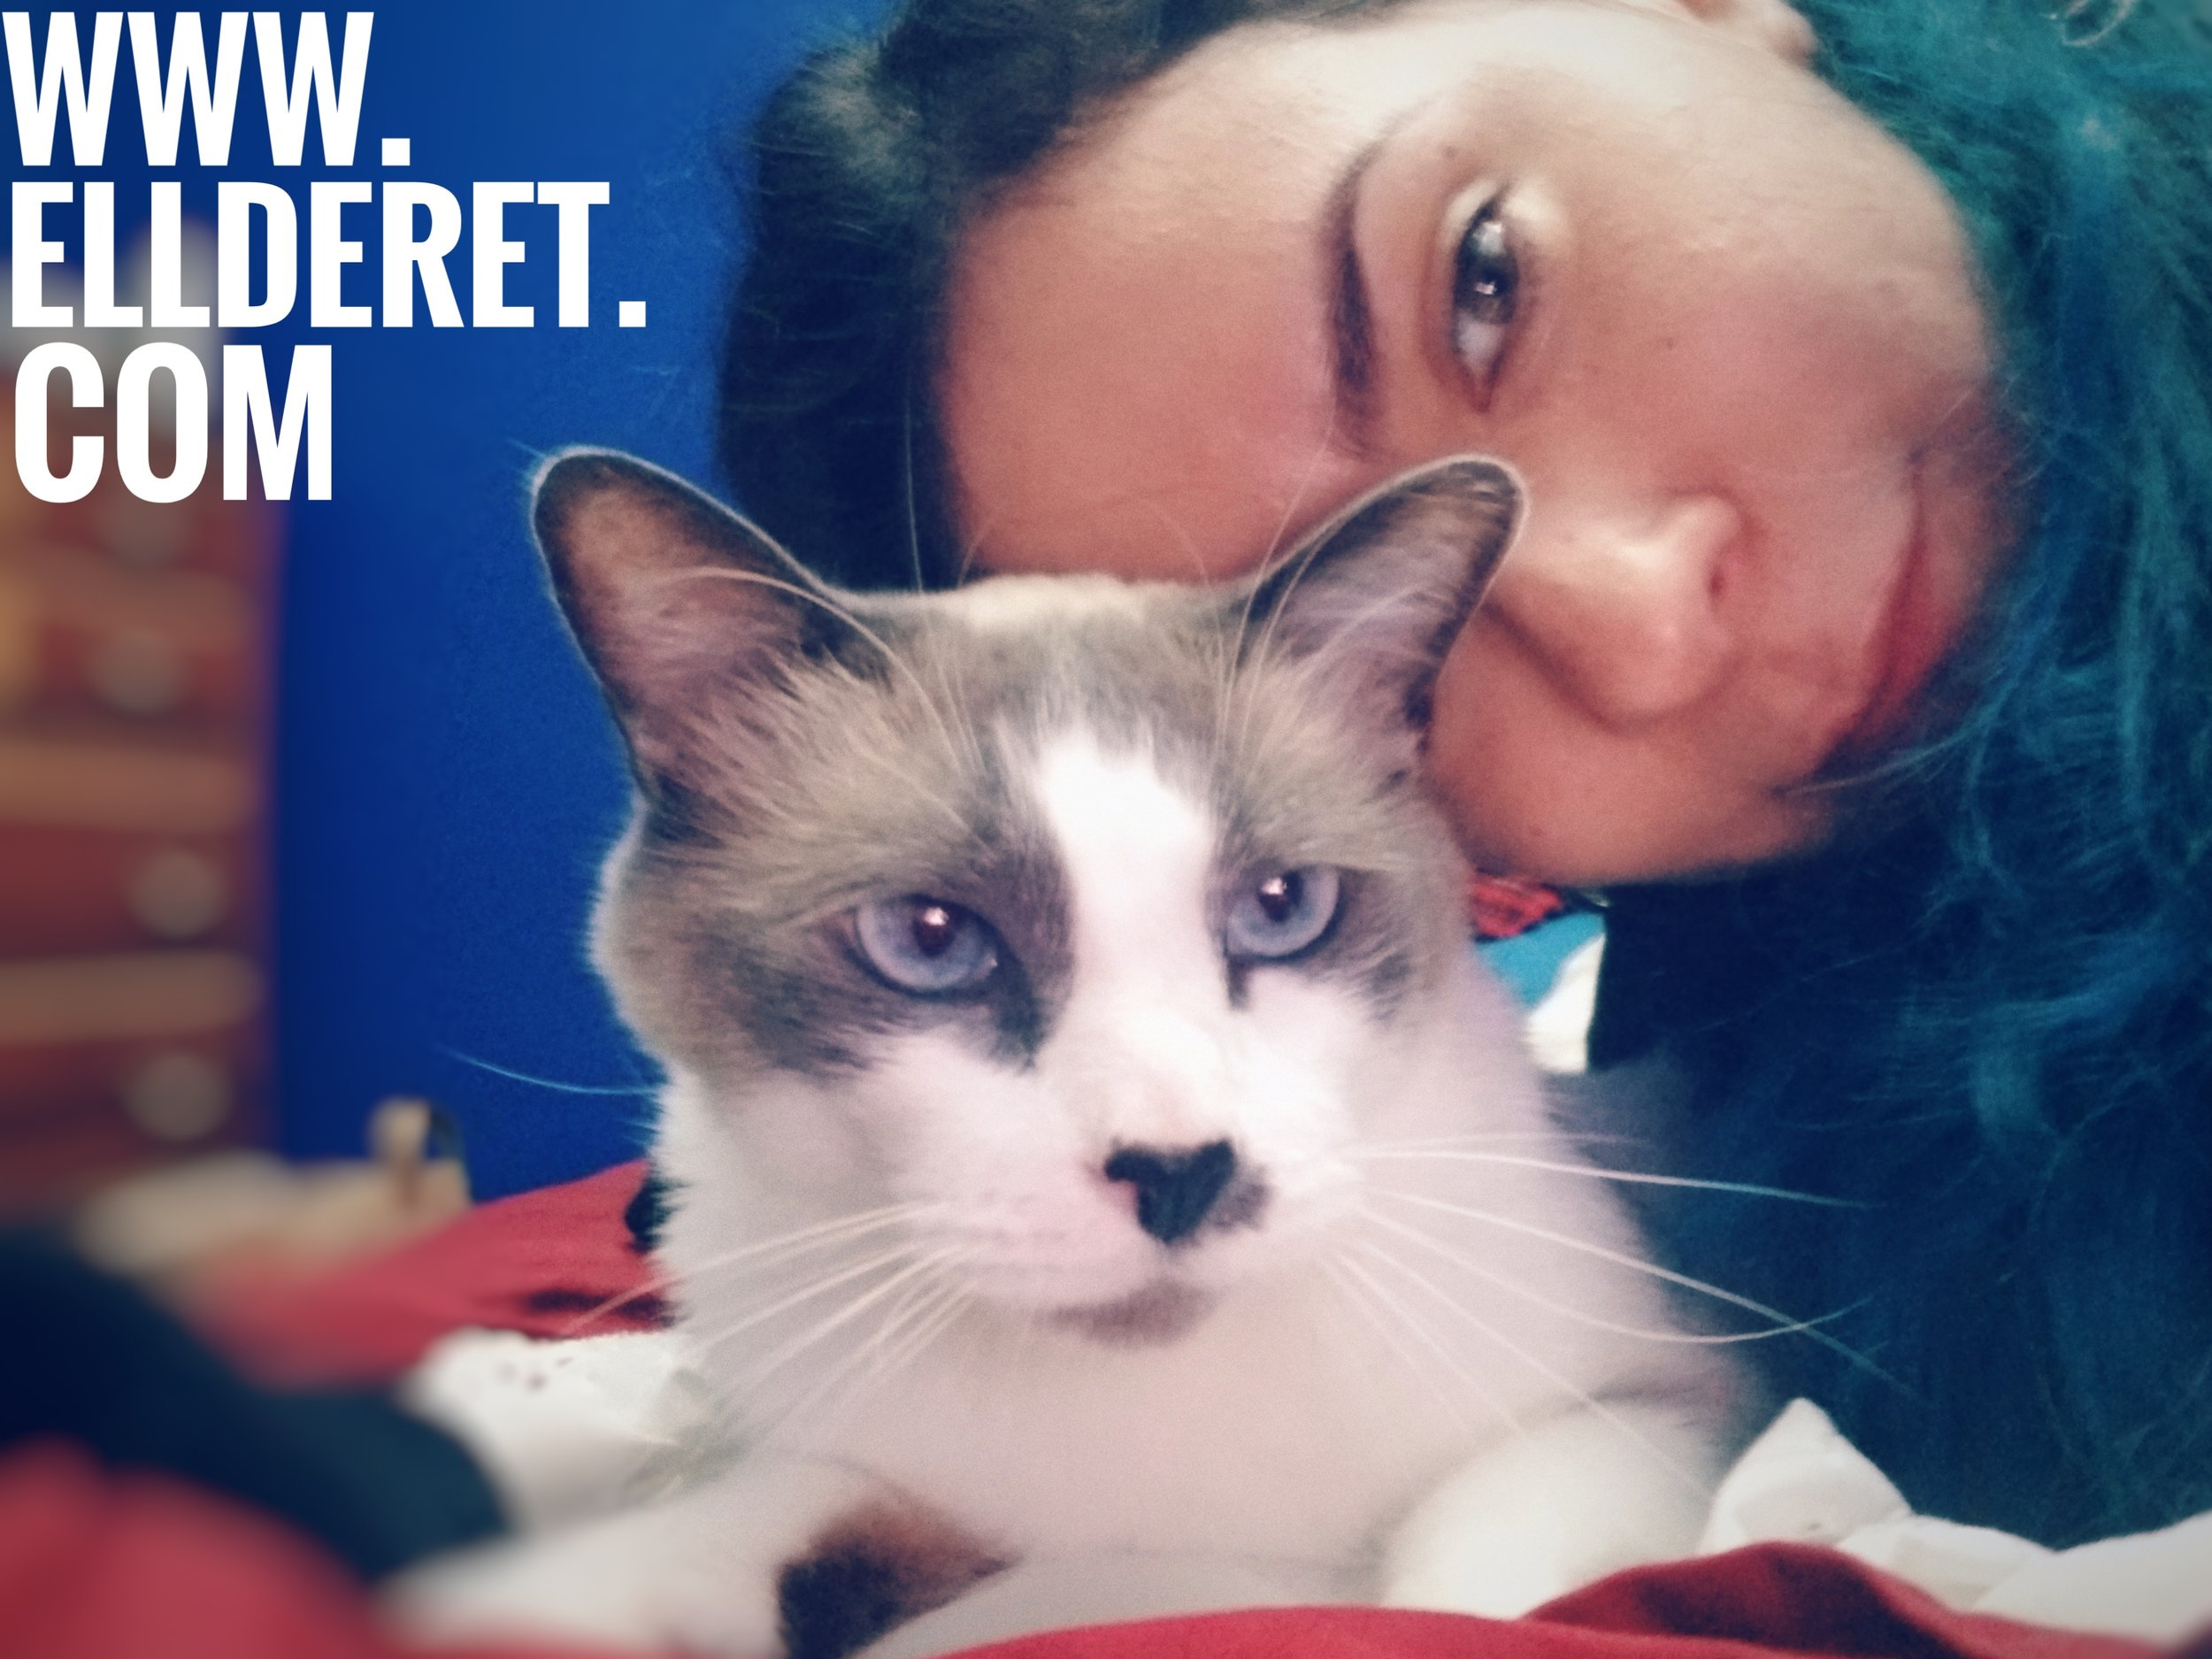 em-markoff-caturday-ellderet-selfie.jpeg